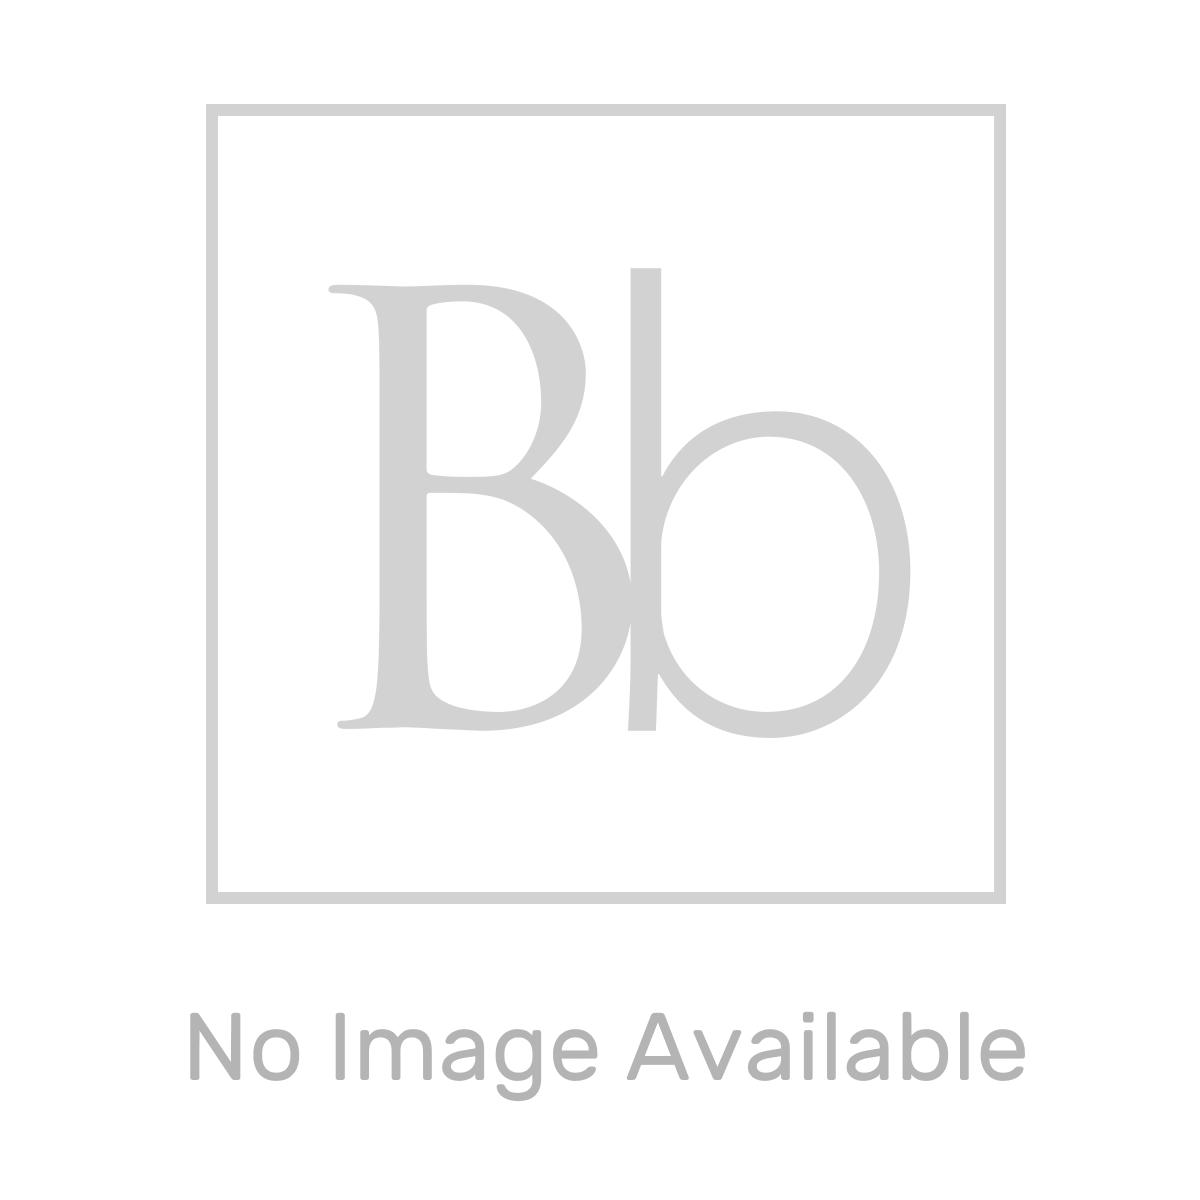 Zenith Rio Bath Shower Mixer Tap Lifestyle